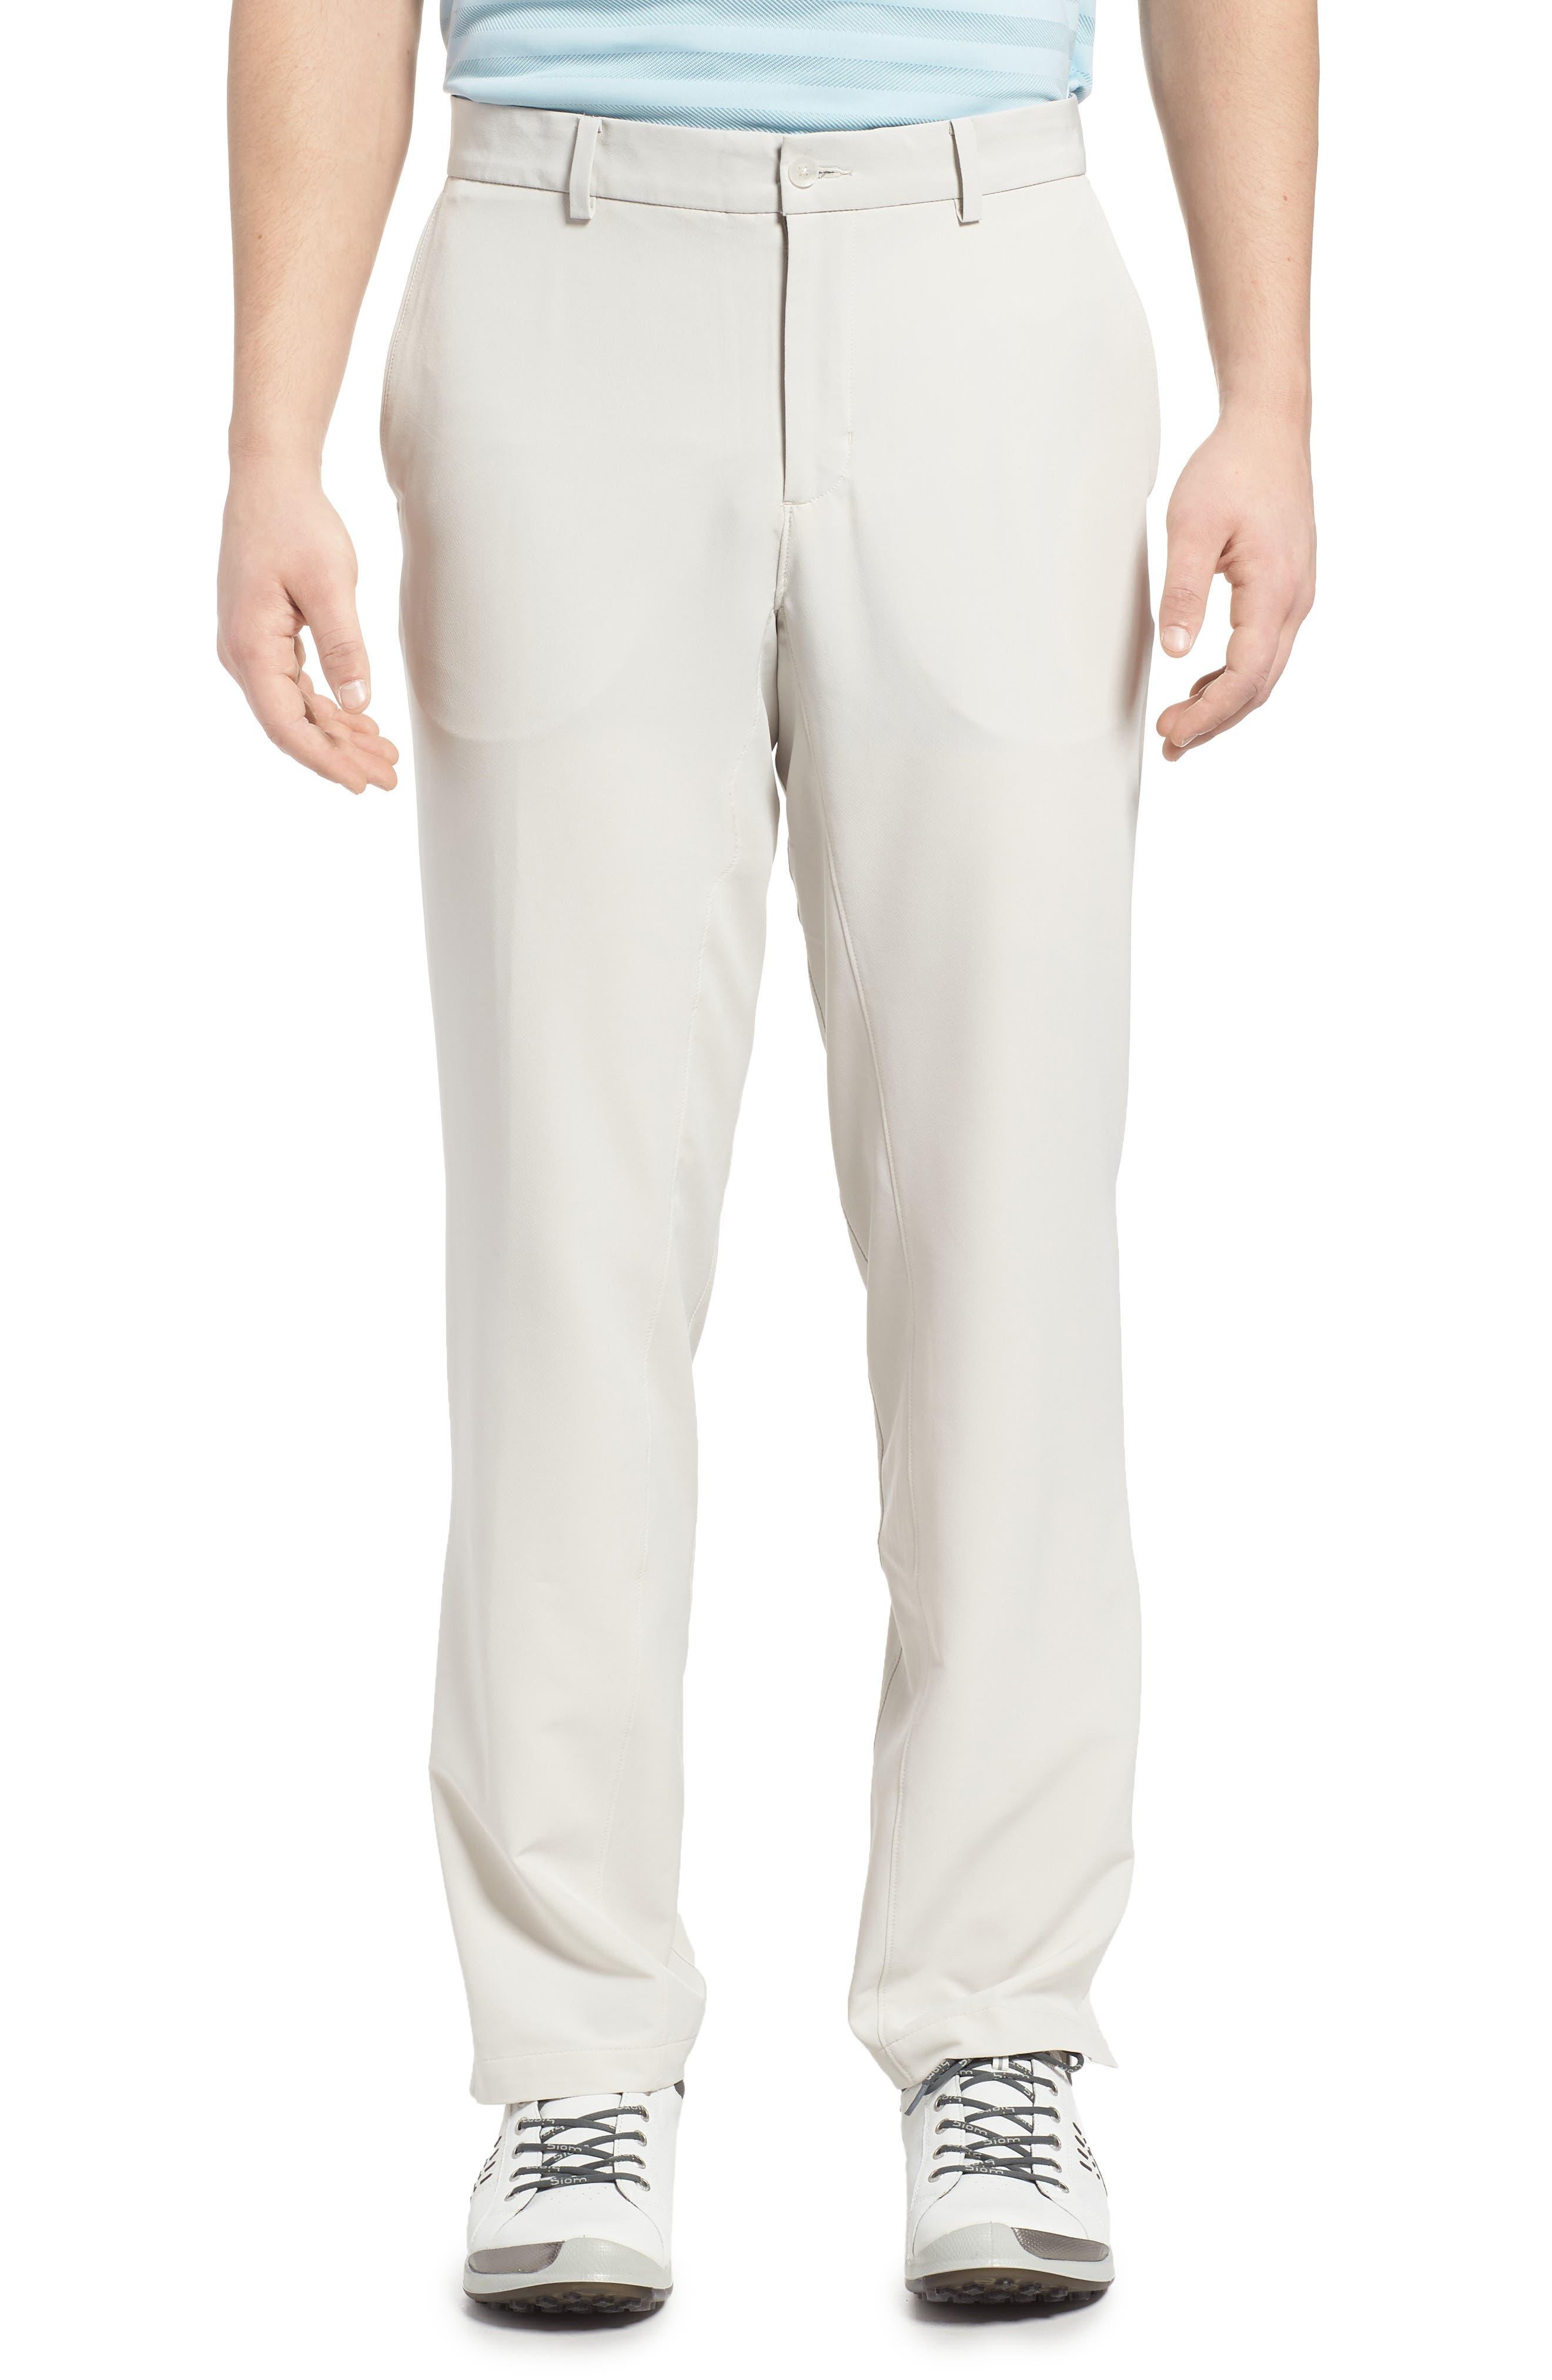 NIKE Hybrid Flex Golf Pants, Main, color, LIGHT BONE/ LIGHT BONE